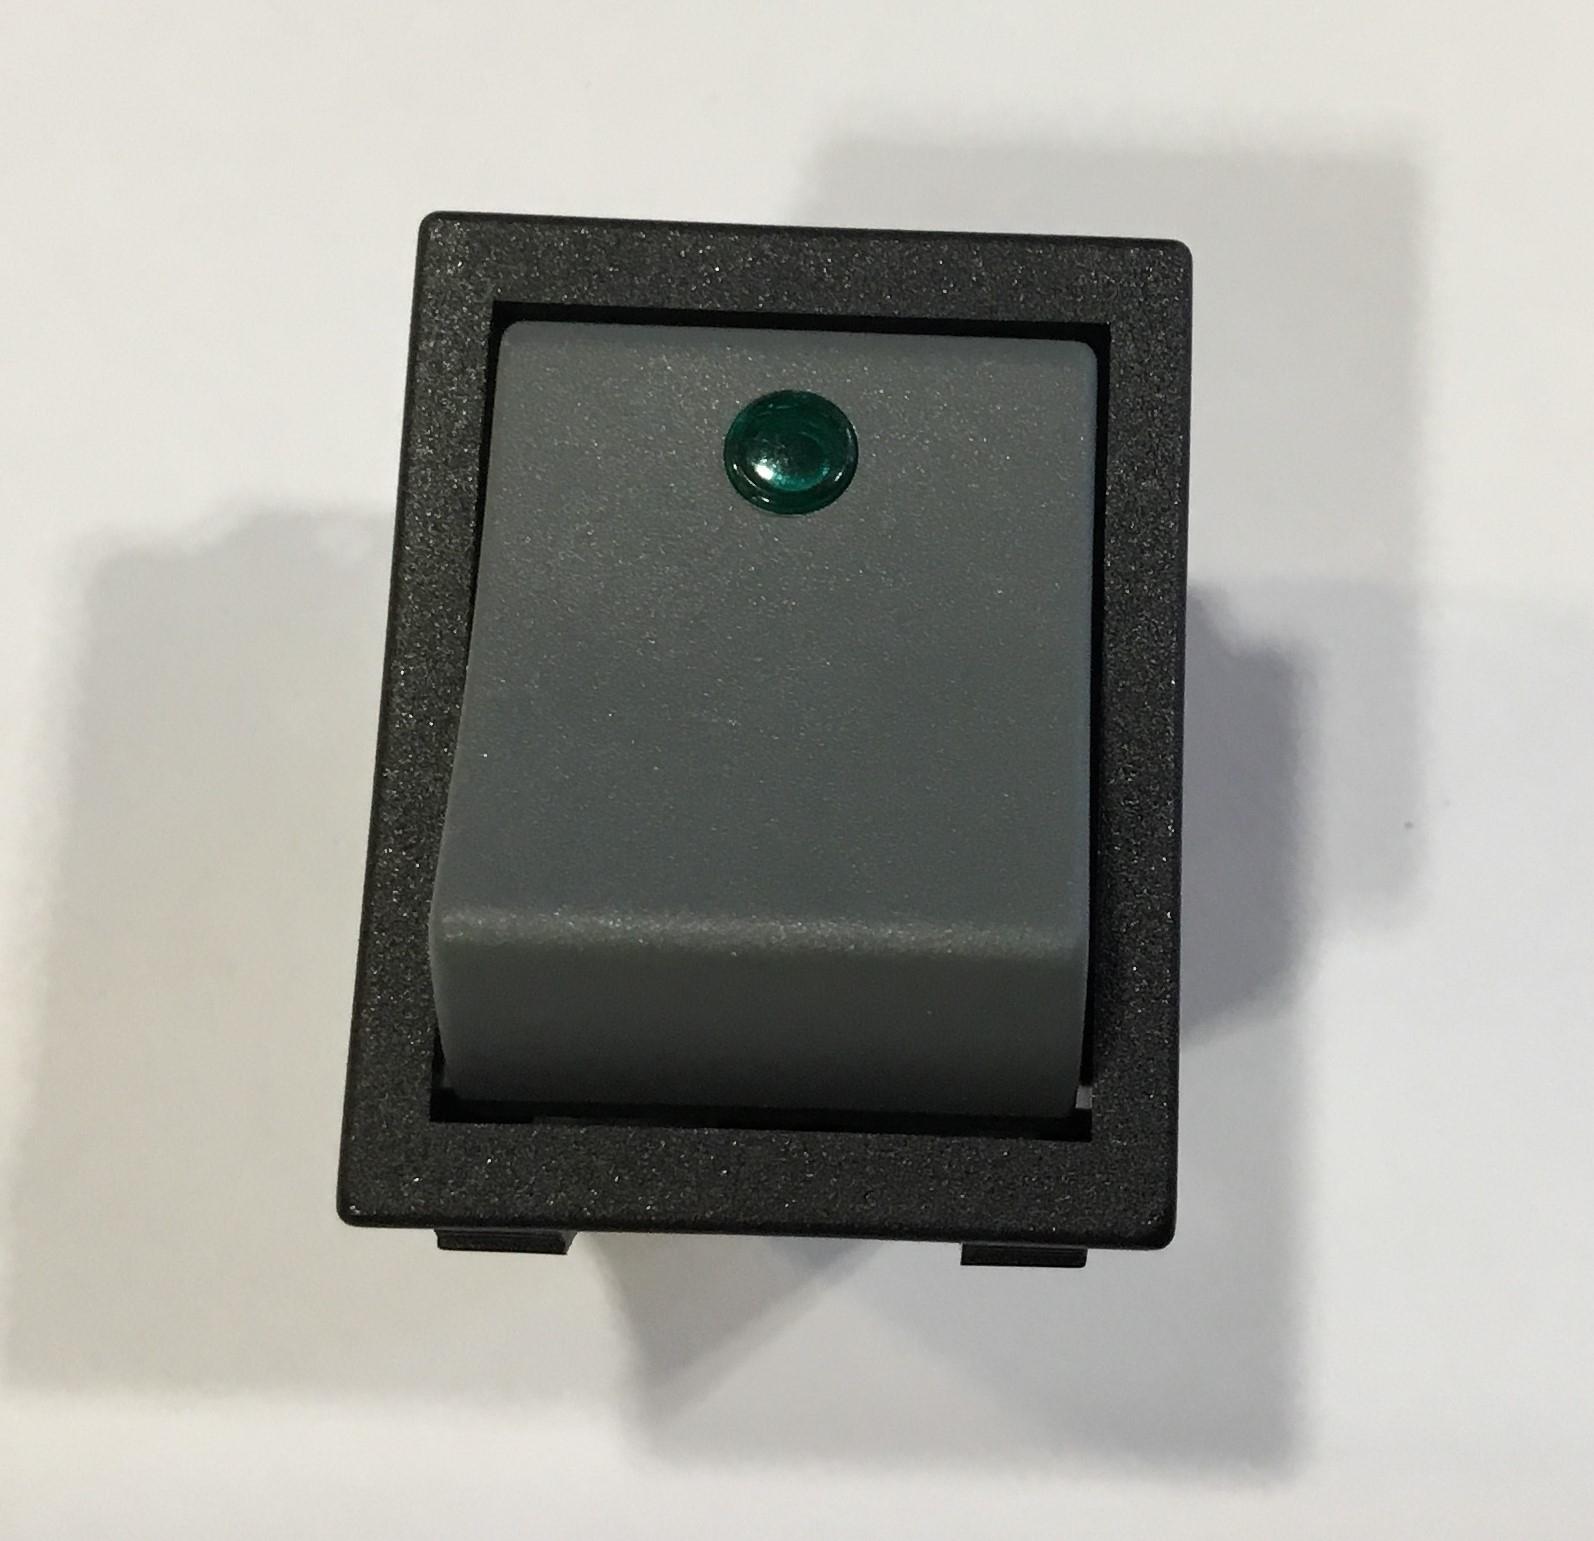 Mains switch